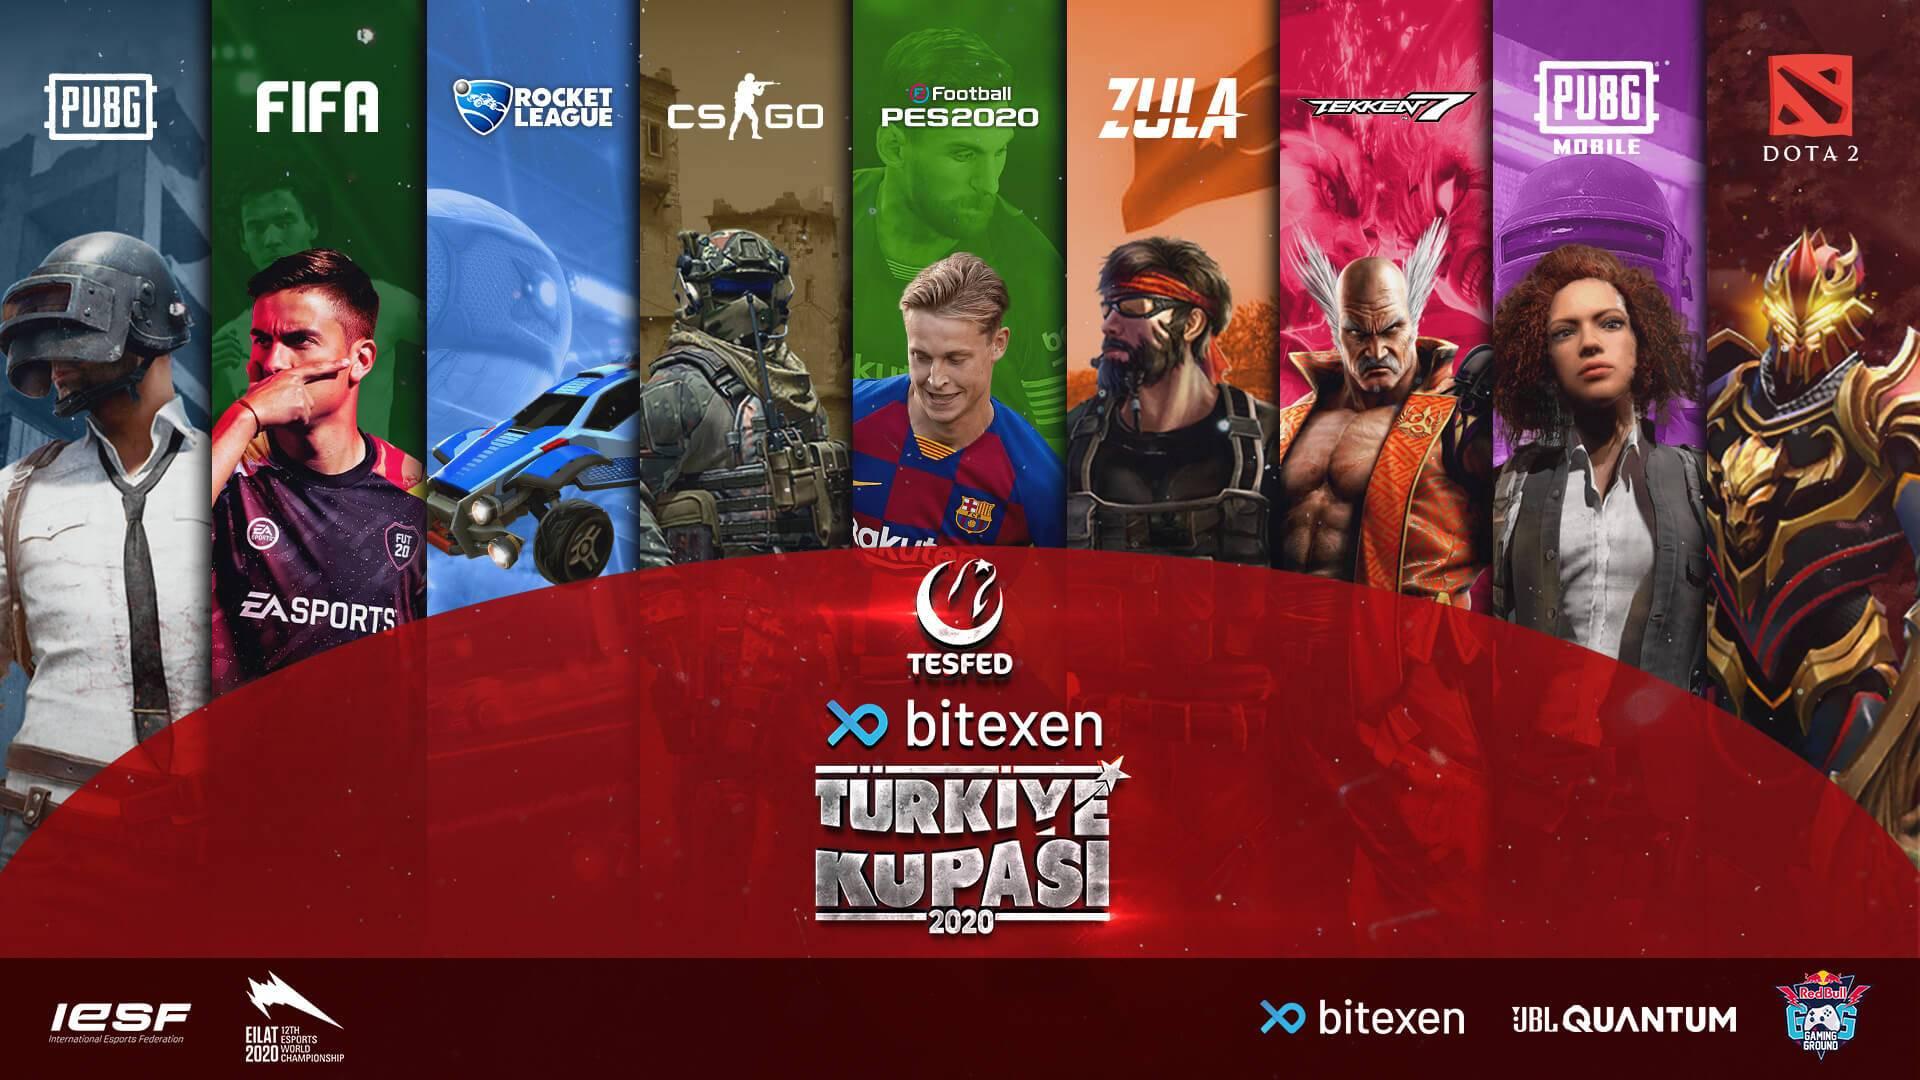 Bitexen TESFED Turkiye Kupasi